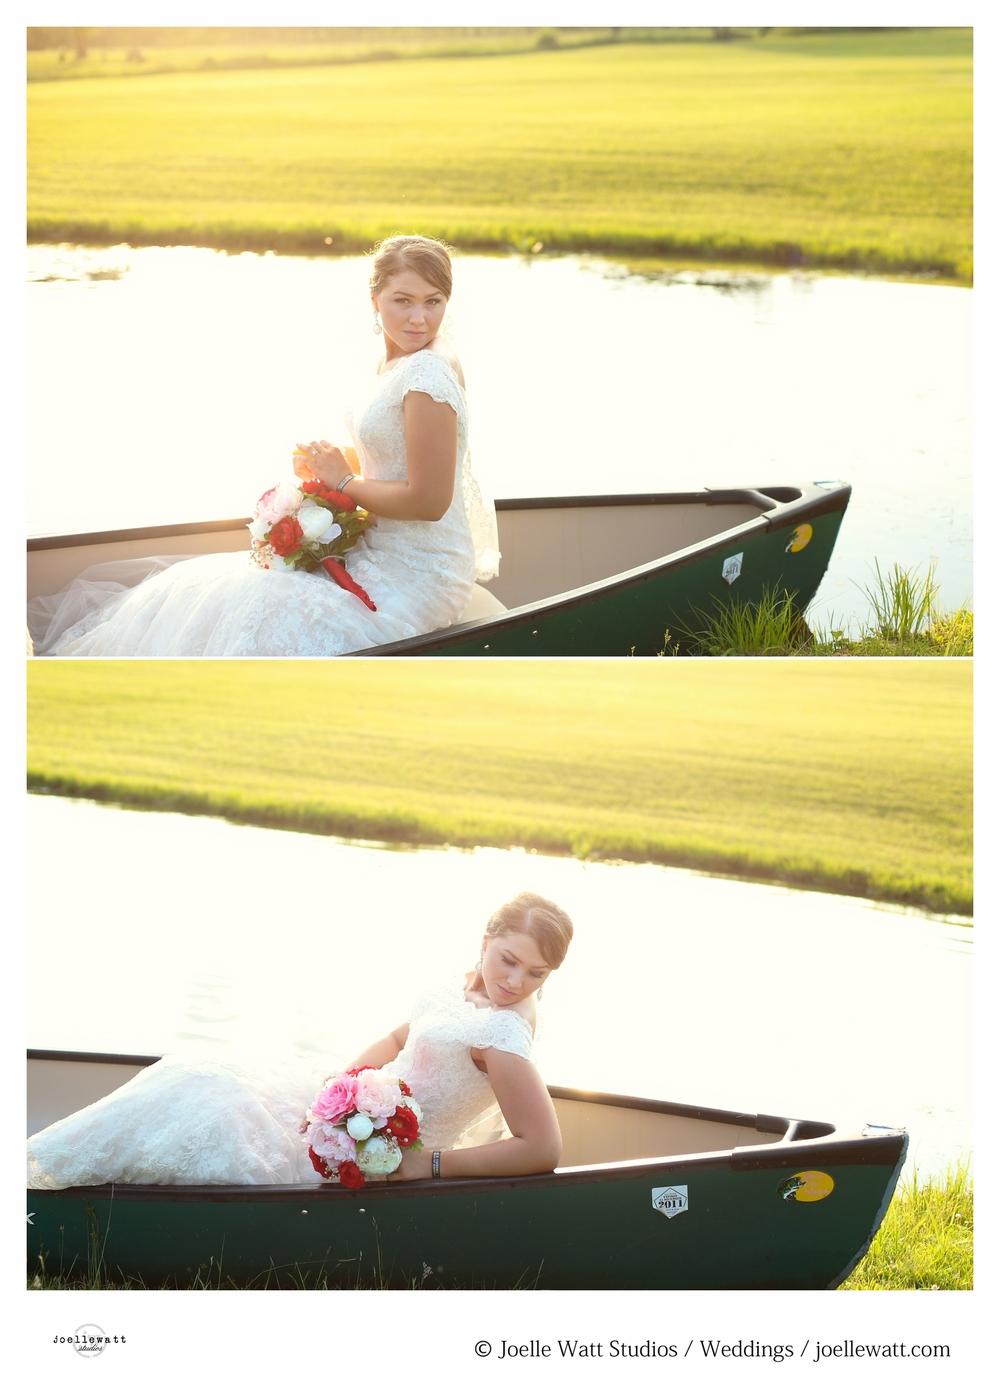 Terwiske Wedding 21.jpg